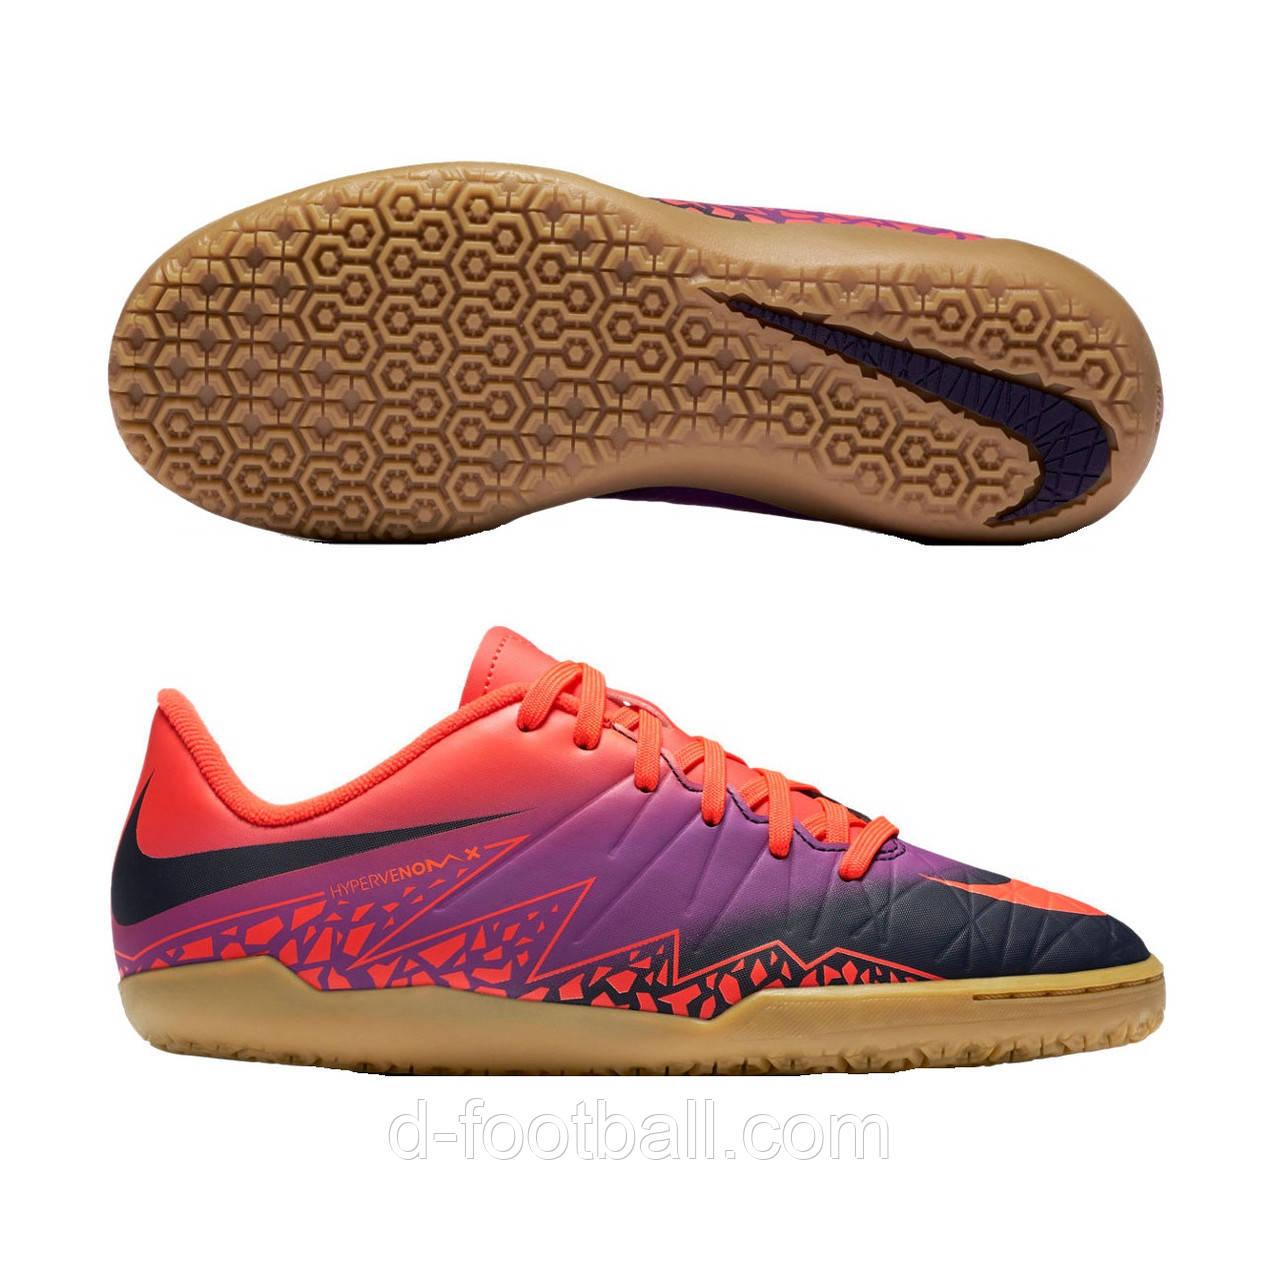 Детские футзалки Nike Hypervenom Phelon II IC JR 749920-845 купить ... 115be6965c2